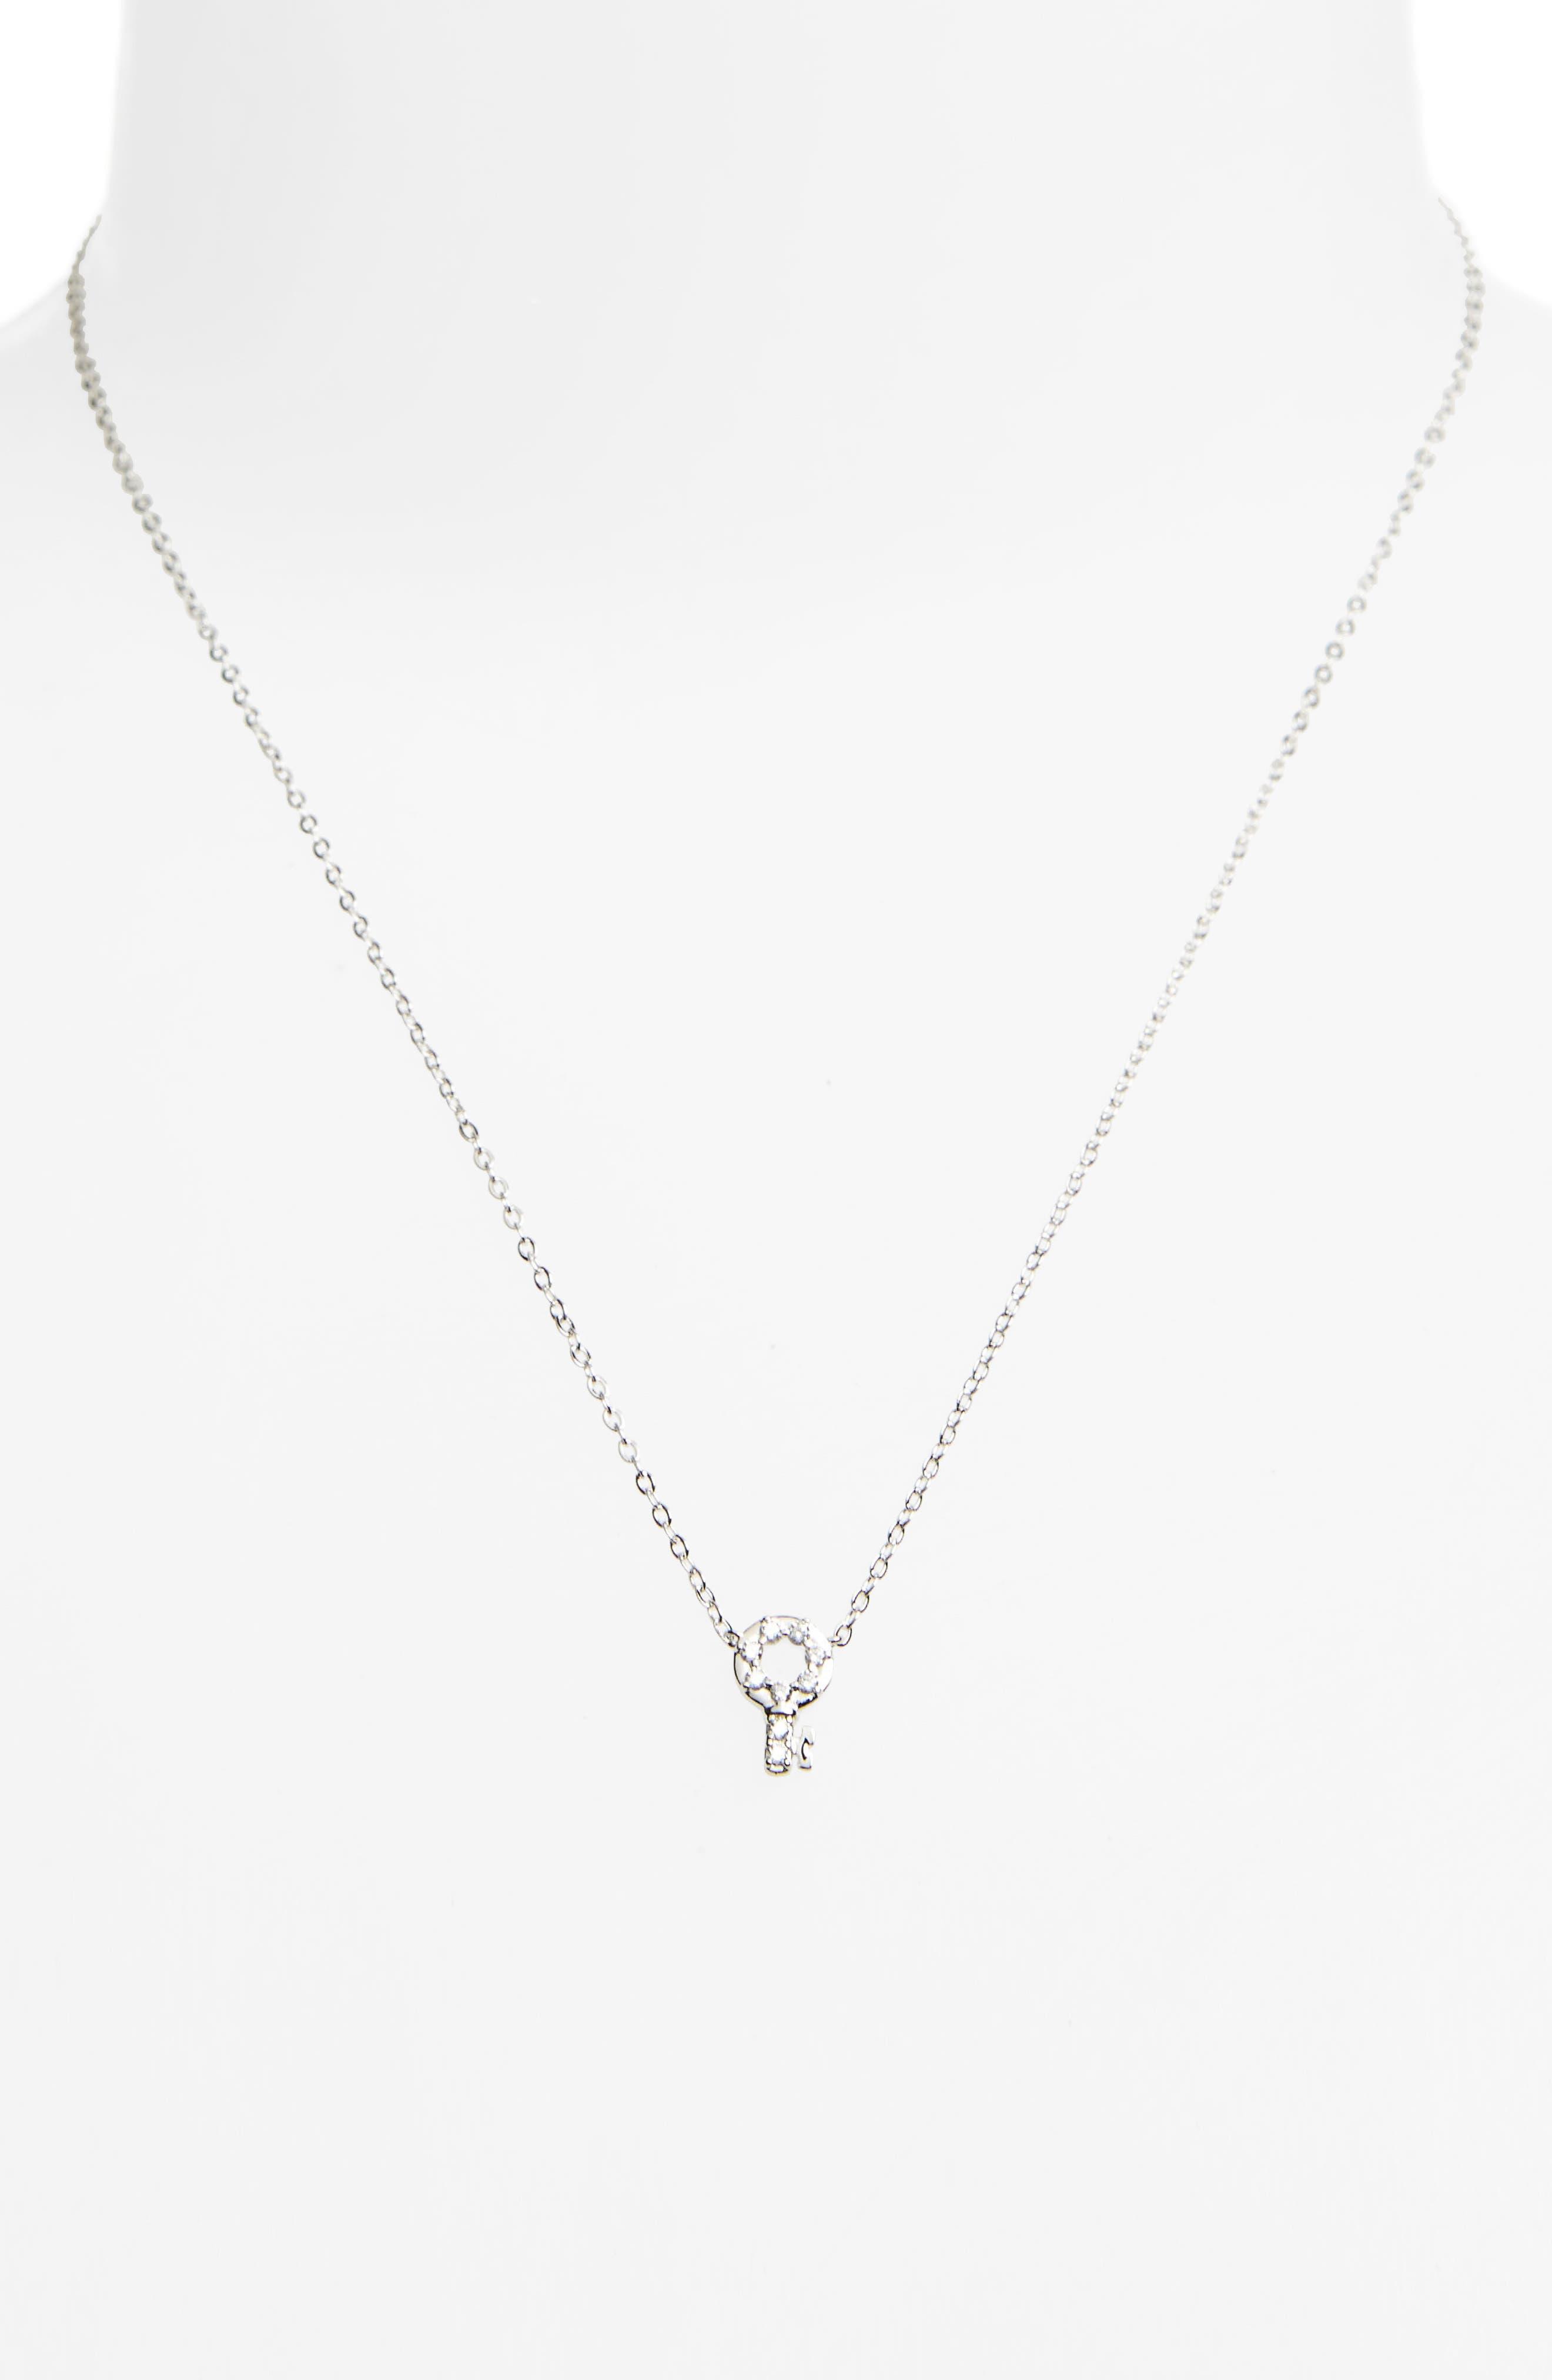 Reminisce Crystal Key Pendant Necklace,                             Alternate thumbnail 2, color,                             040